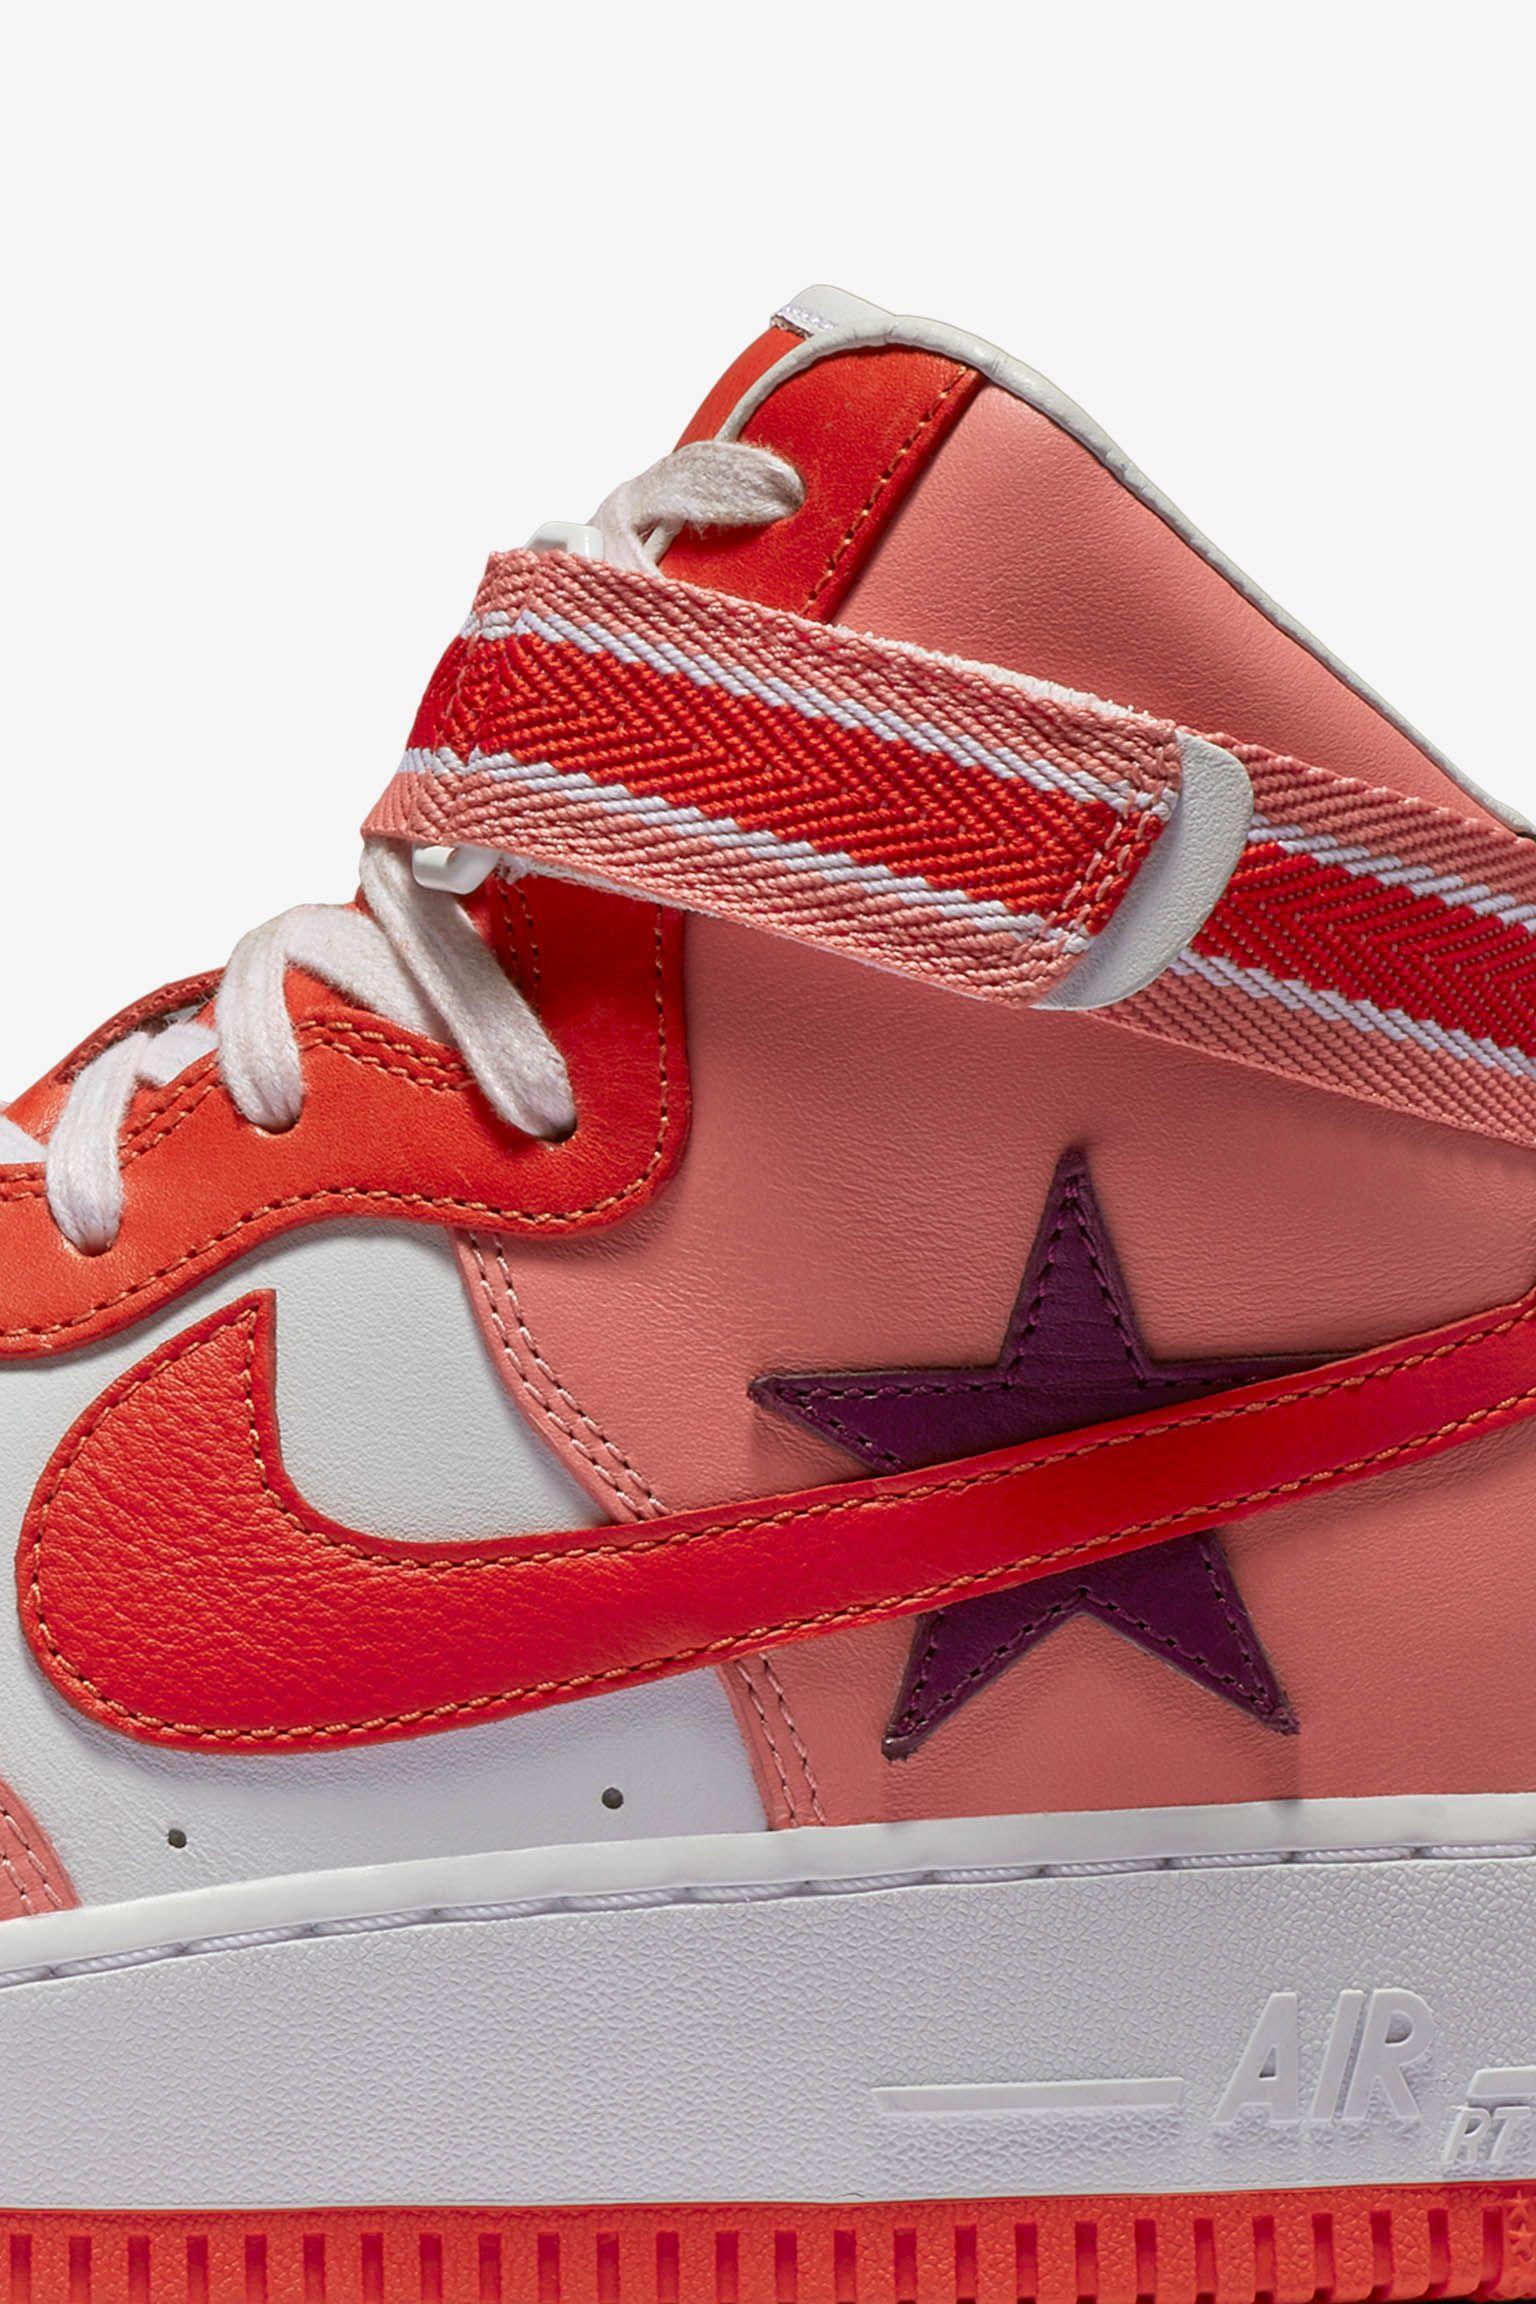 Nike Air Force 1 High x RT 'Sunblush & Bordeaux' Release Date